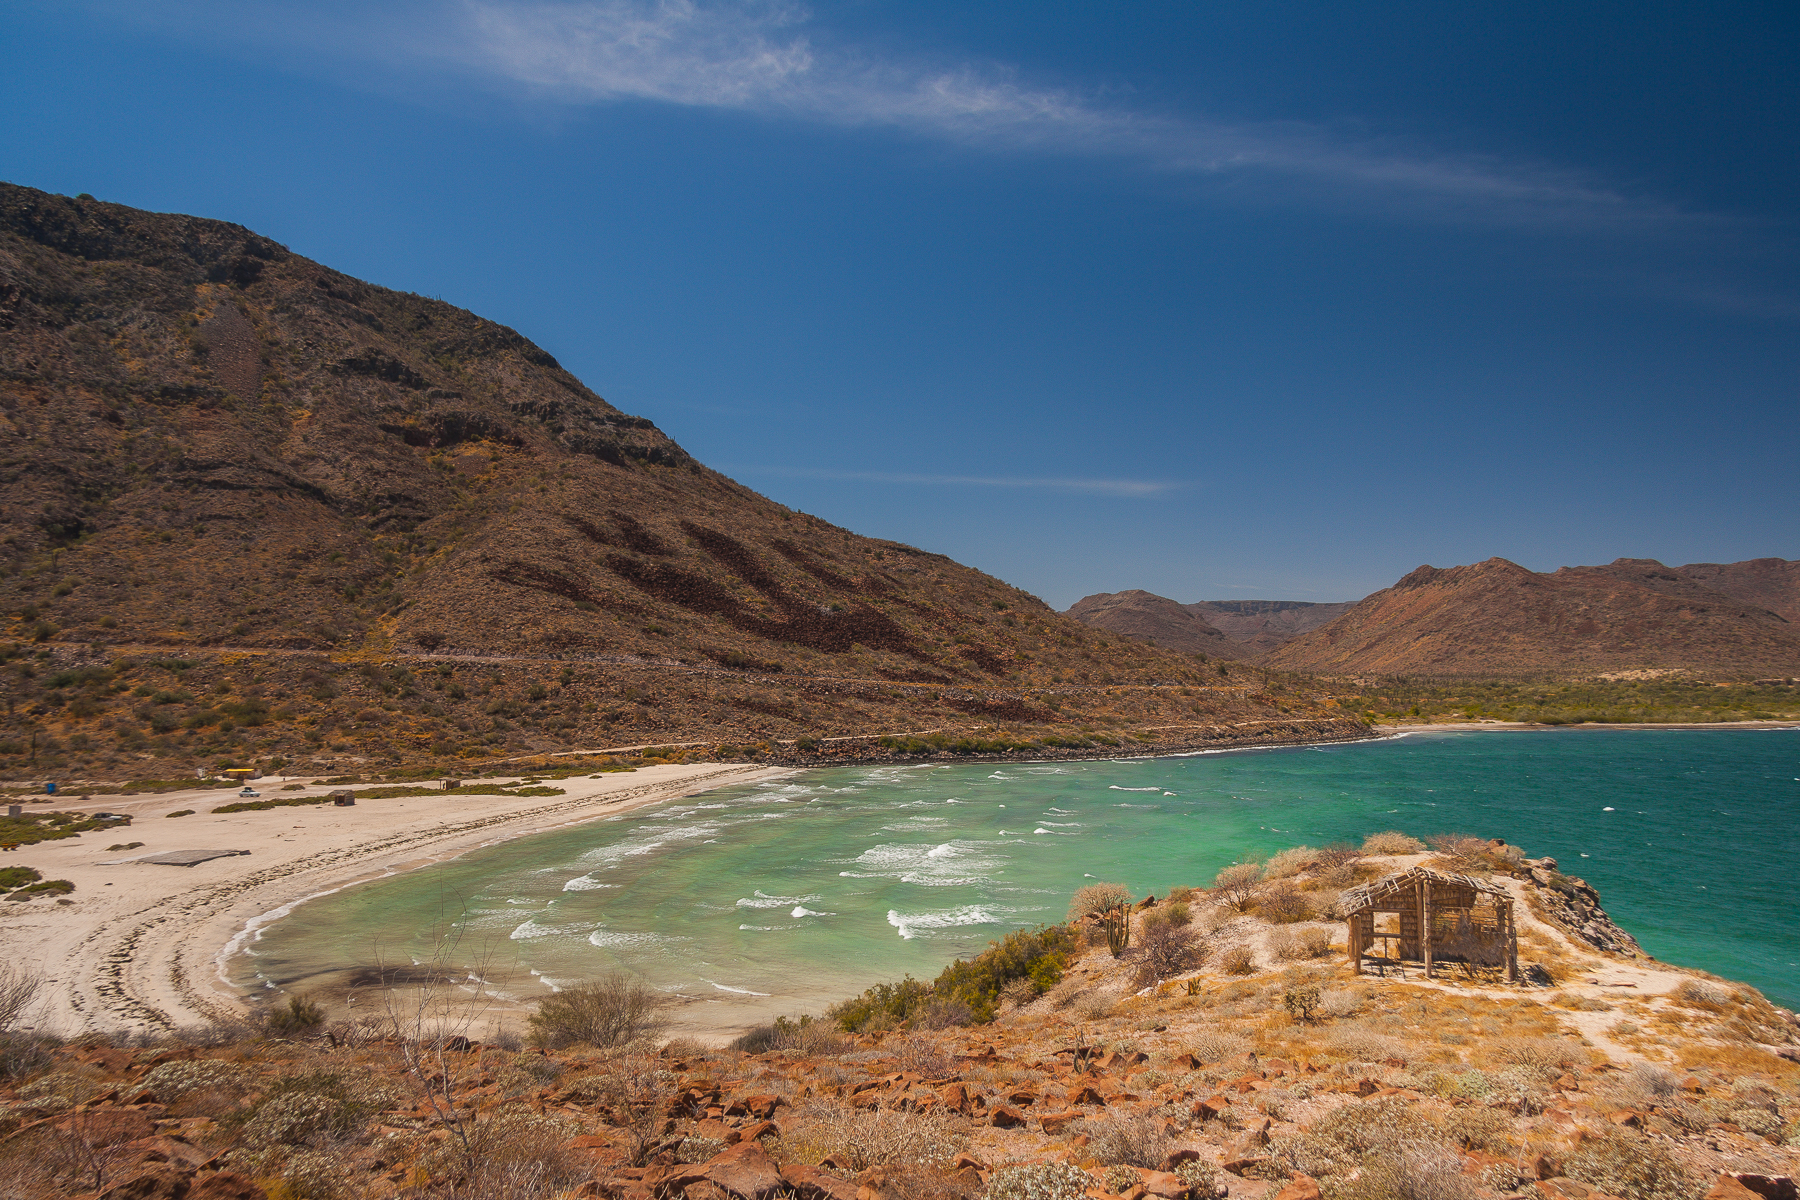 Playa en Bahía de Concepción, Baja California Sur, México.